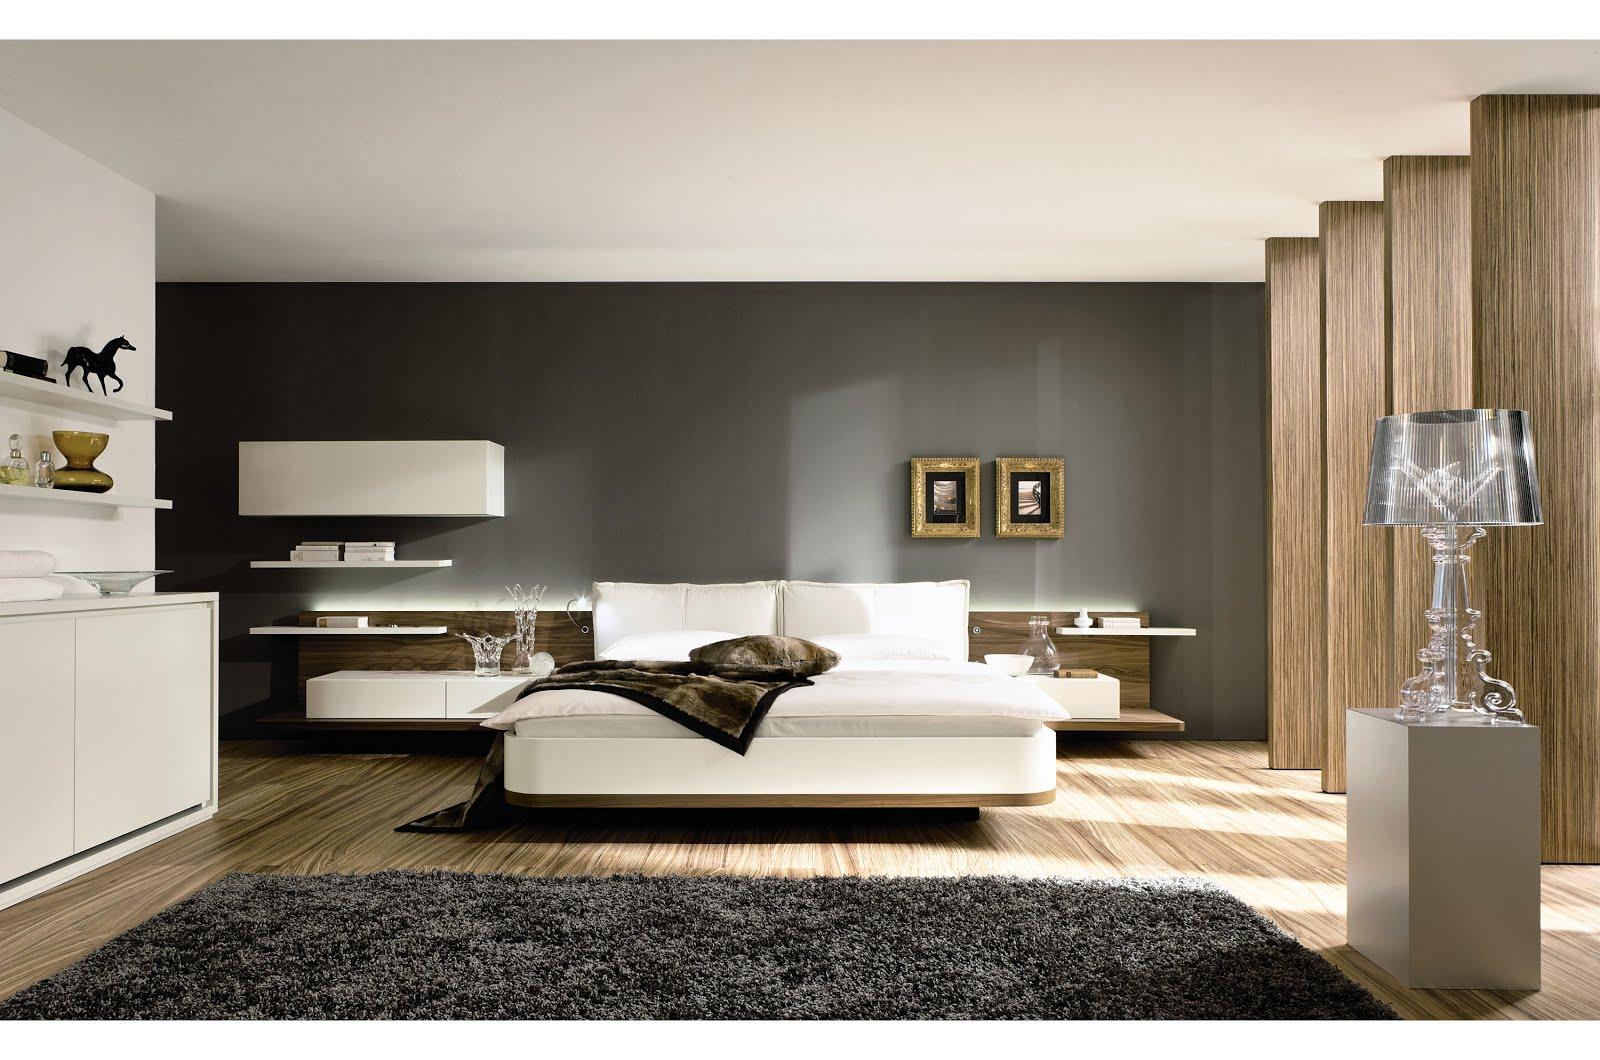 5 Kombinasi Warna Interior Rumah Modern Selain Putih Terbaru Wajib Baca